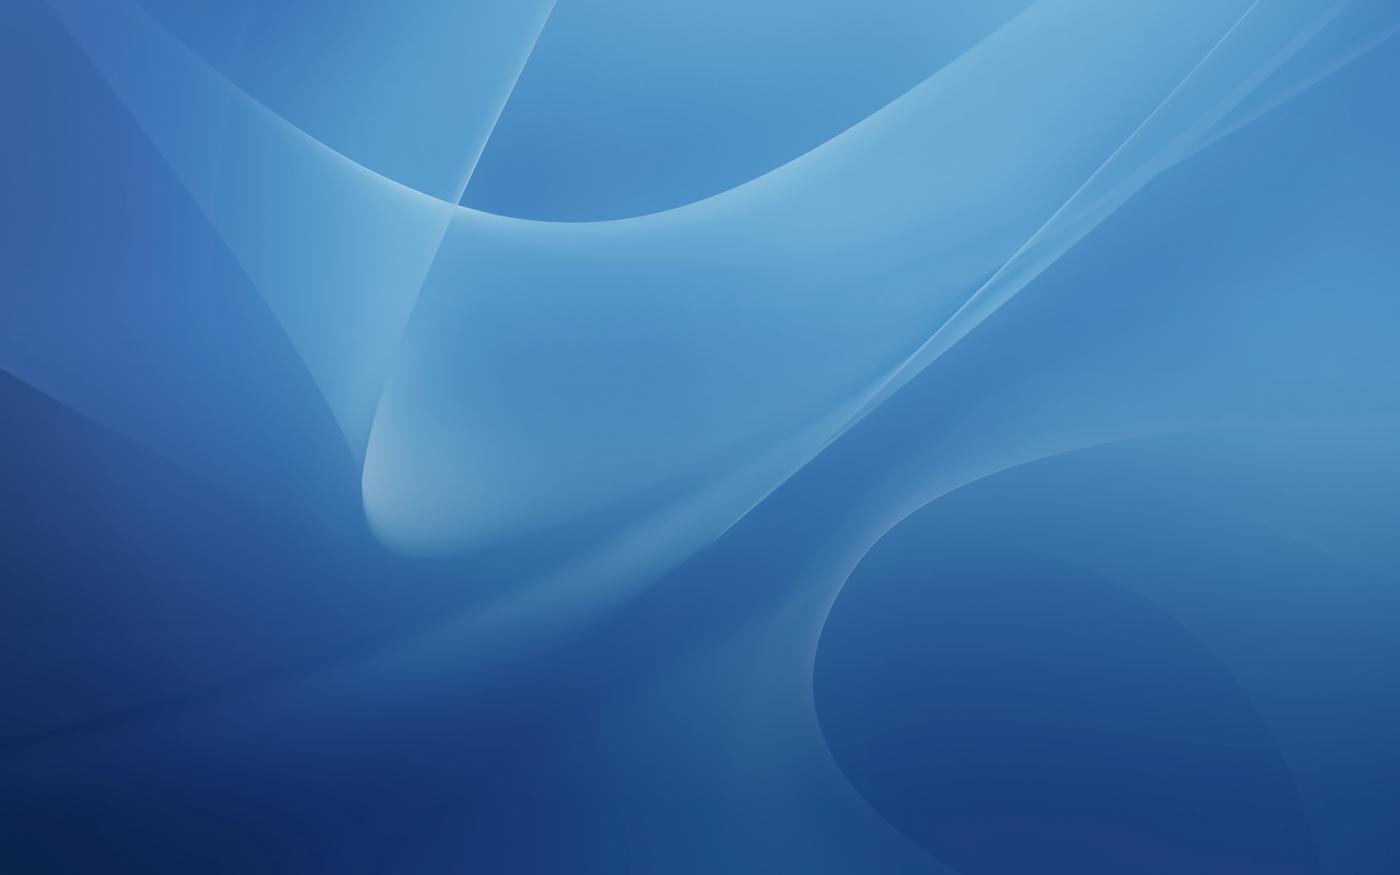 every default macos wallpaper in glorious 5k resolution 512 pixels every default macos wallpaper in